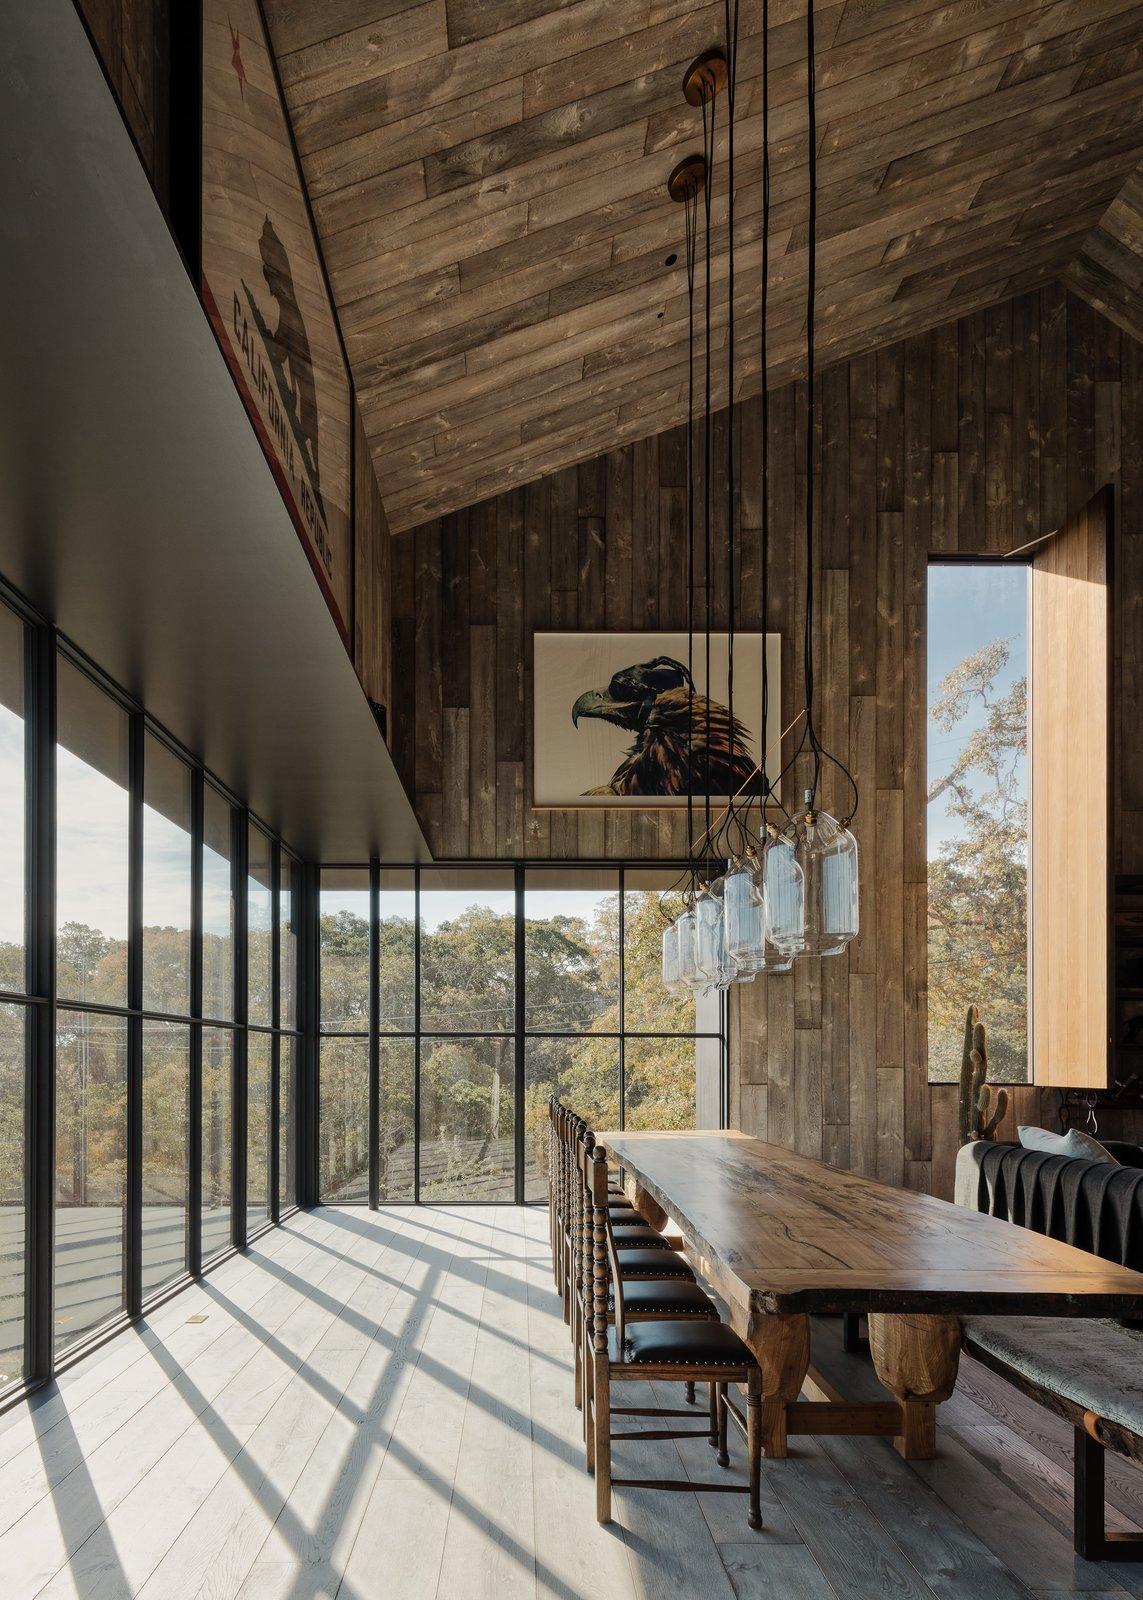 Dining Room Big Barn  Big Barn by Faulkner Architects